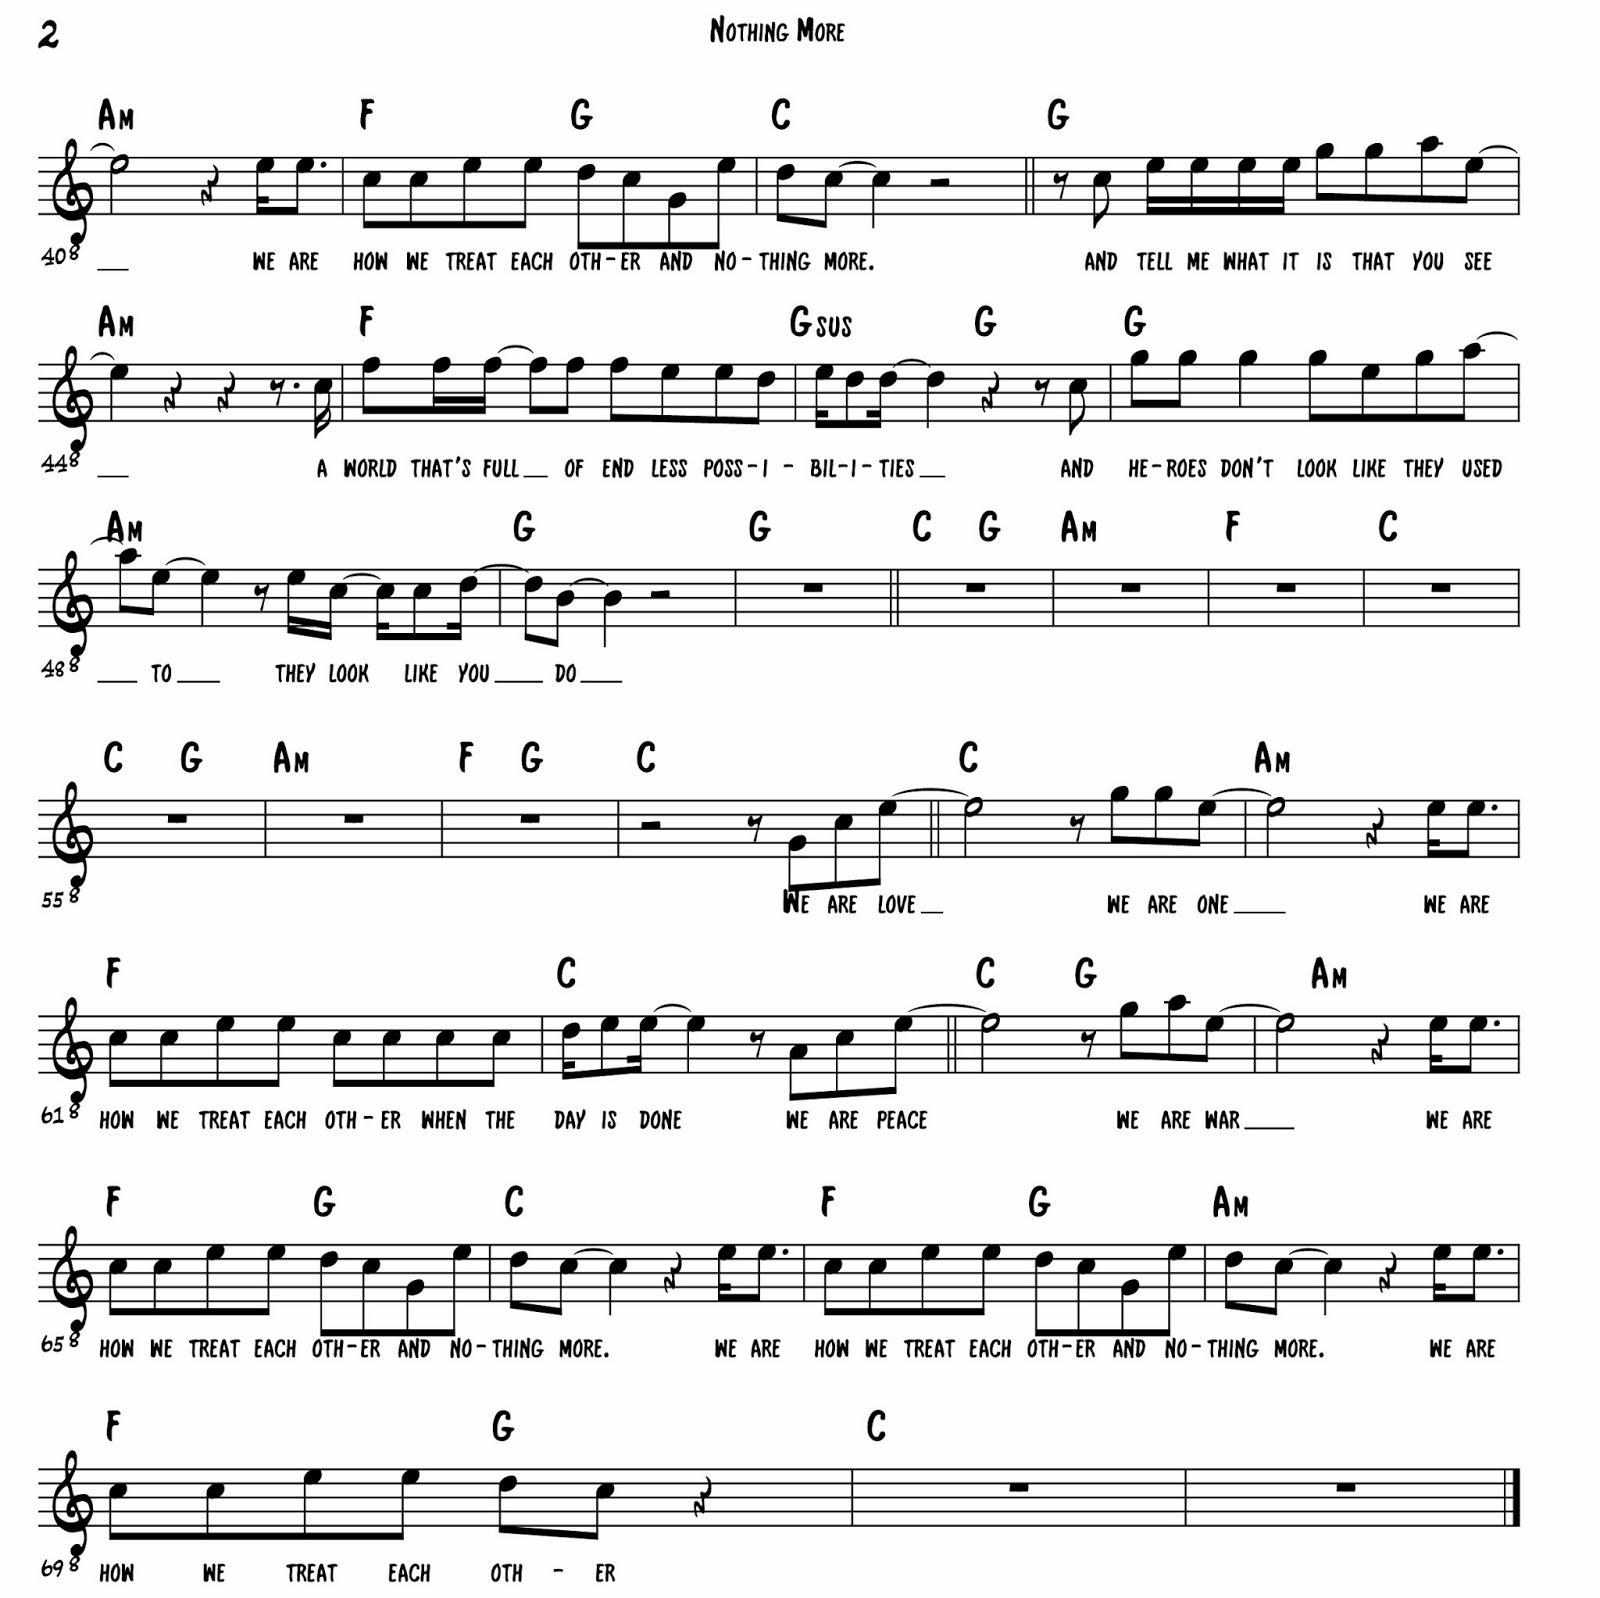 Remember Me Lyrics Sheet Music: Mary's Be A GoodDog Blog: NCIS Christmas Song: December 17